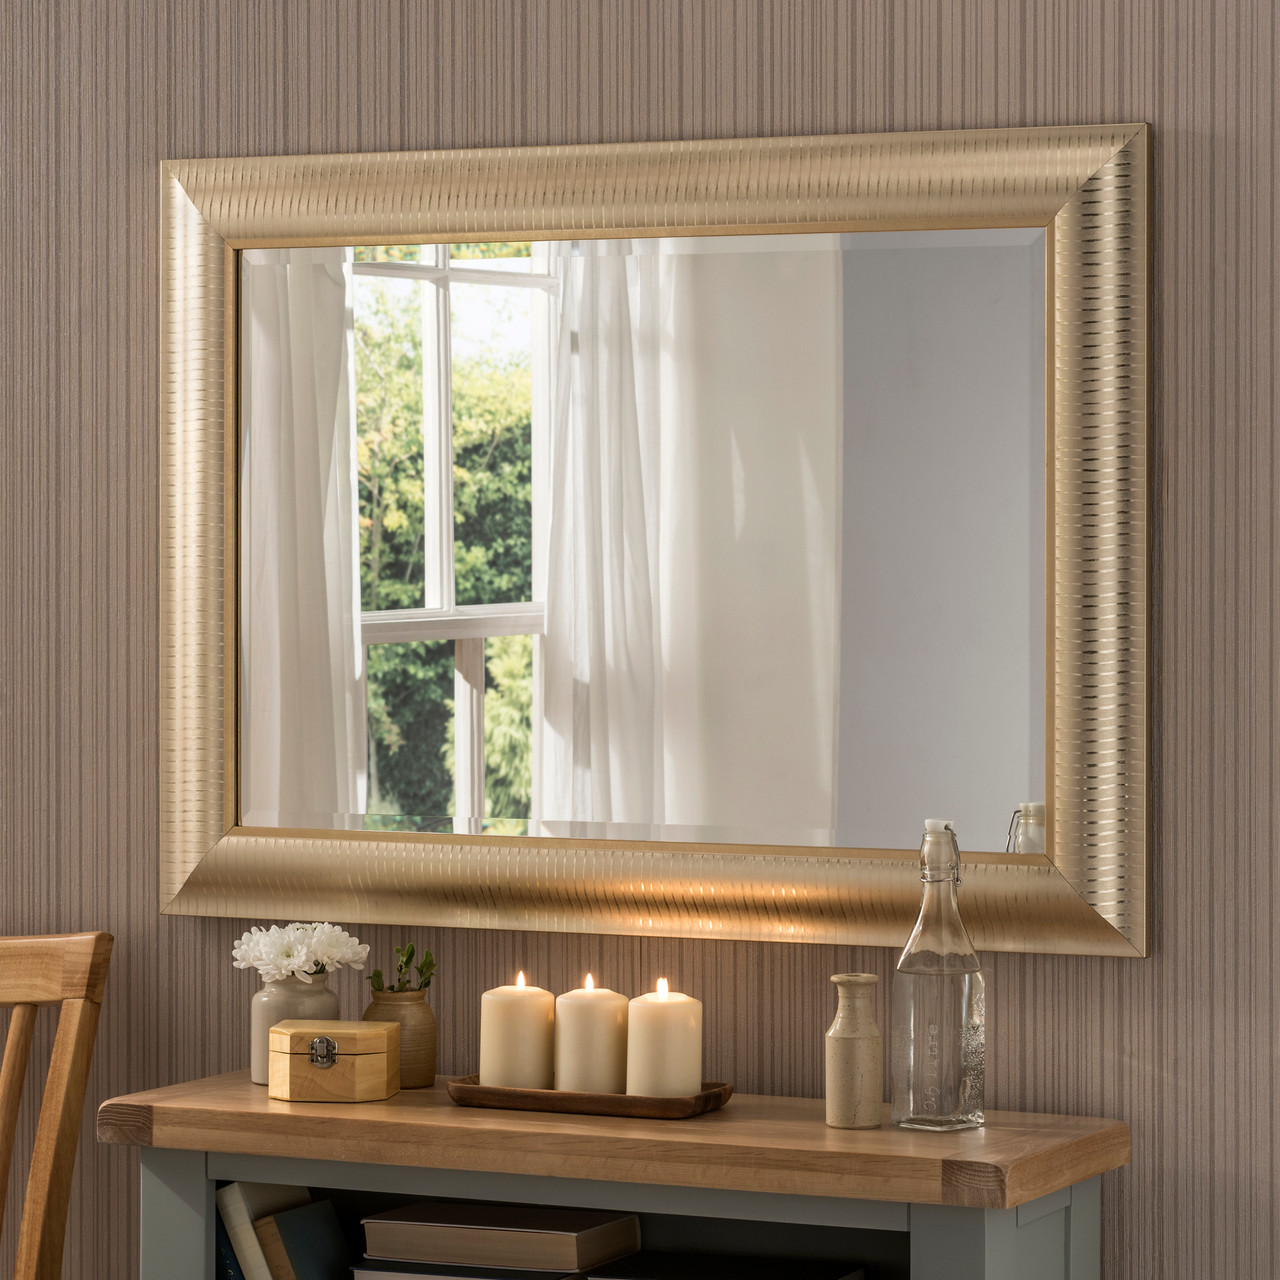 Image of Kenzie Champagne Gold Rectangular Mirror